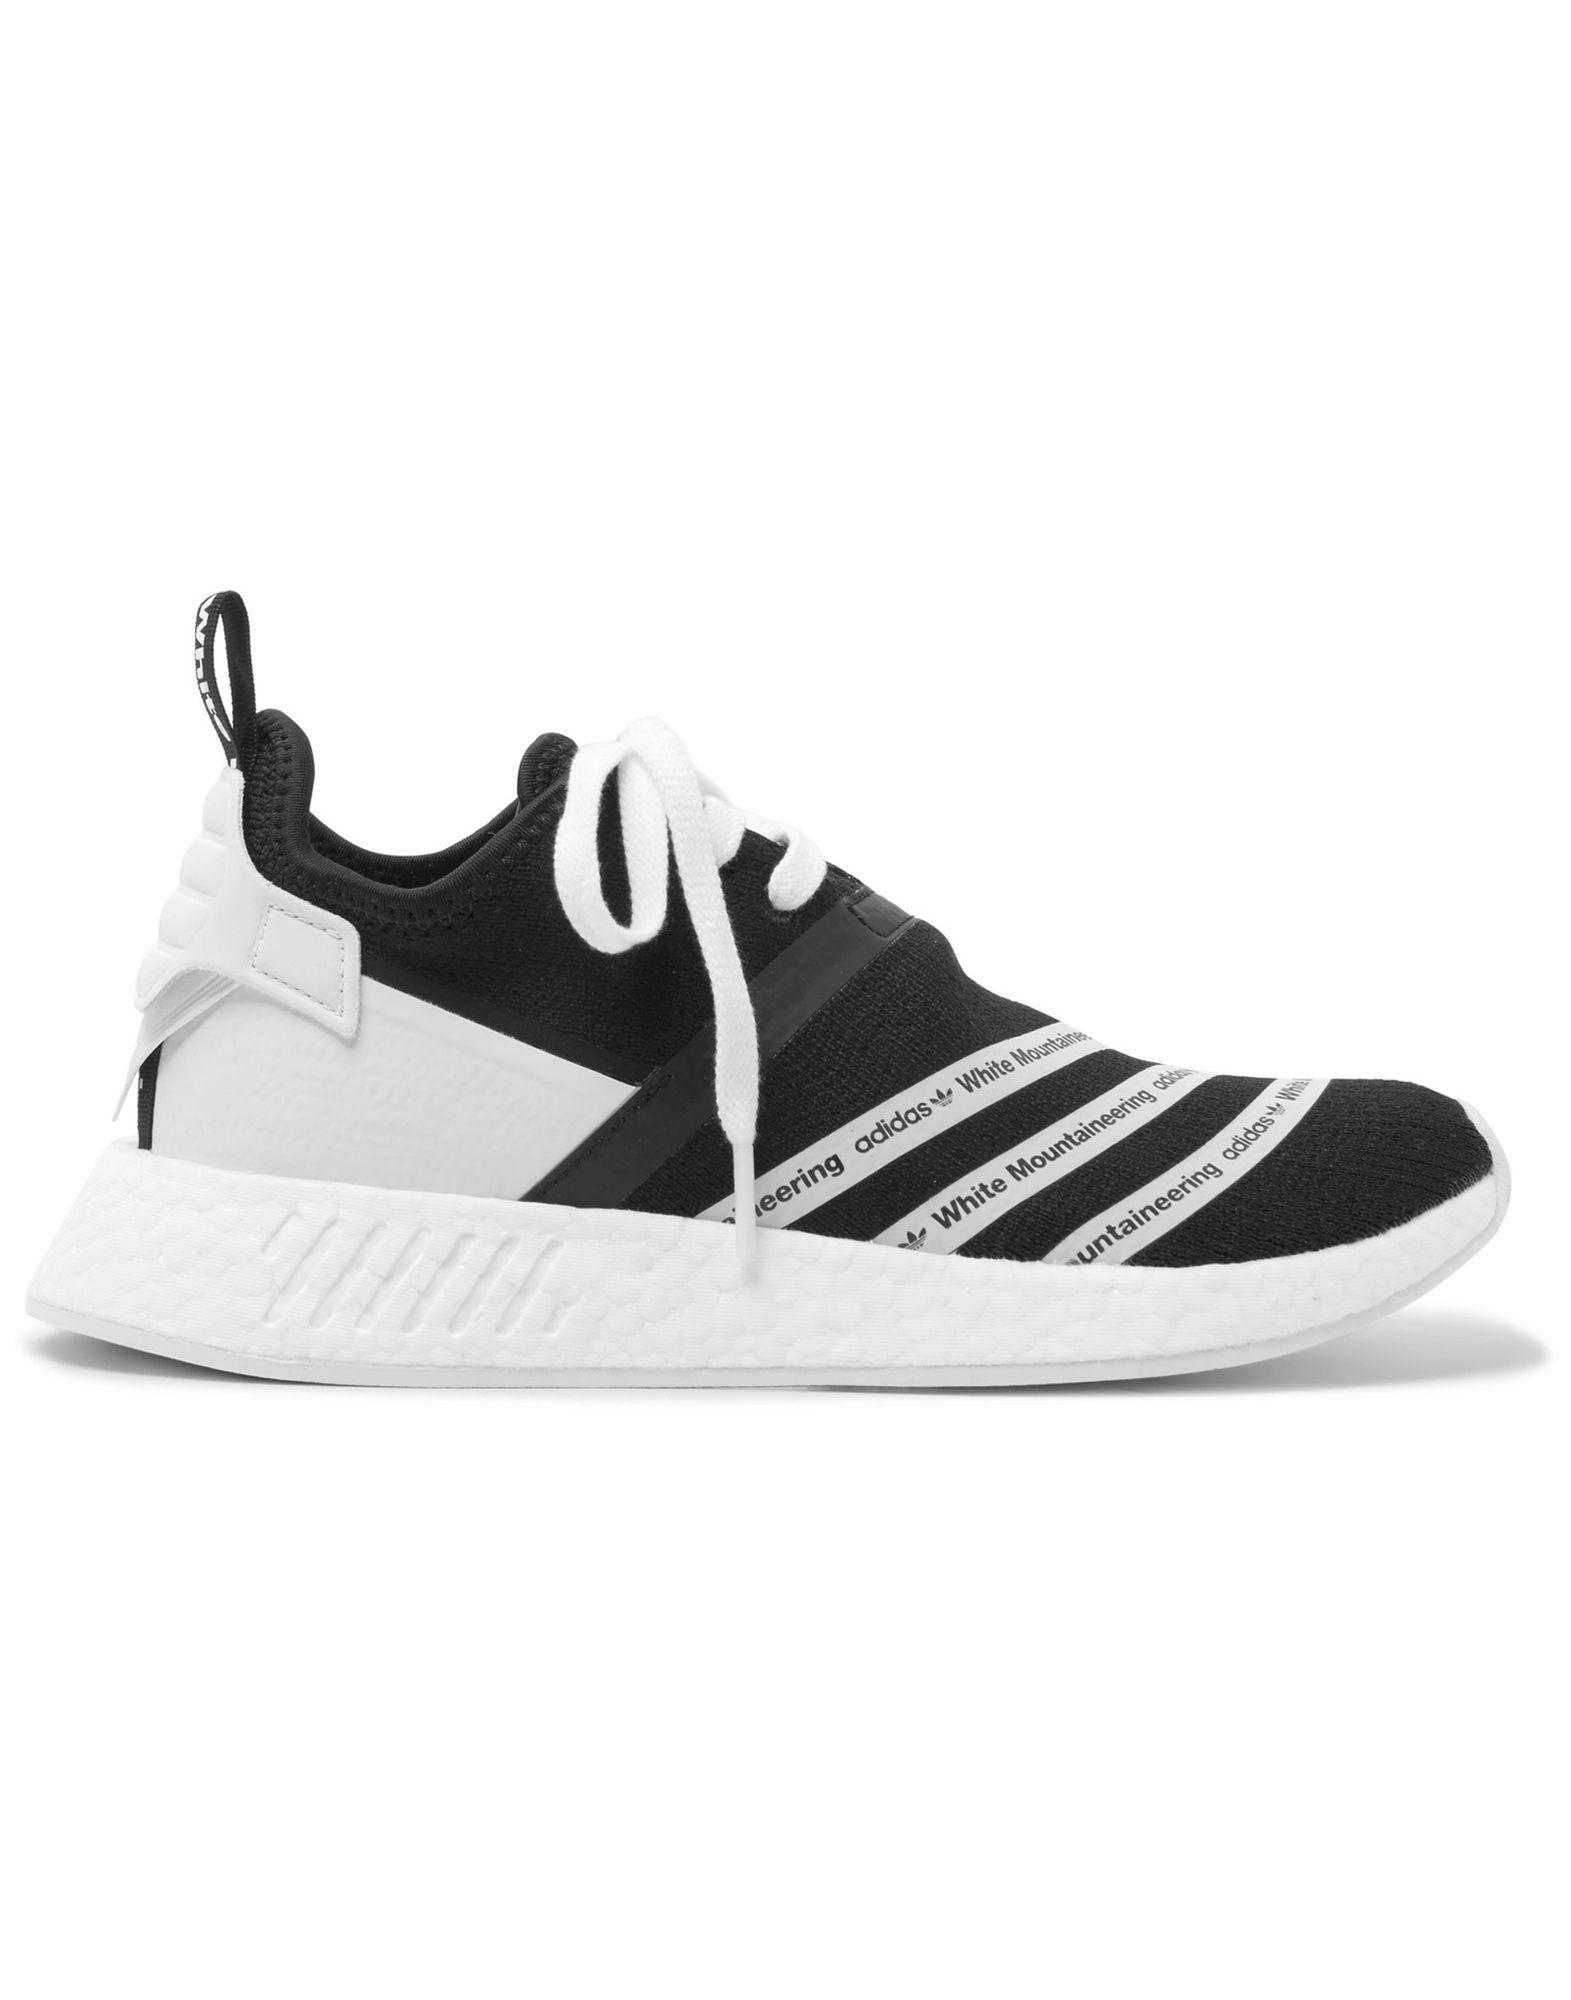 8ffbb2ed599 Lyst - adidas Originals Low-tops & Sneakers in Black for Men